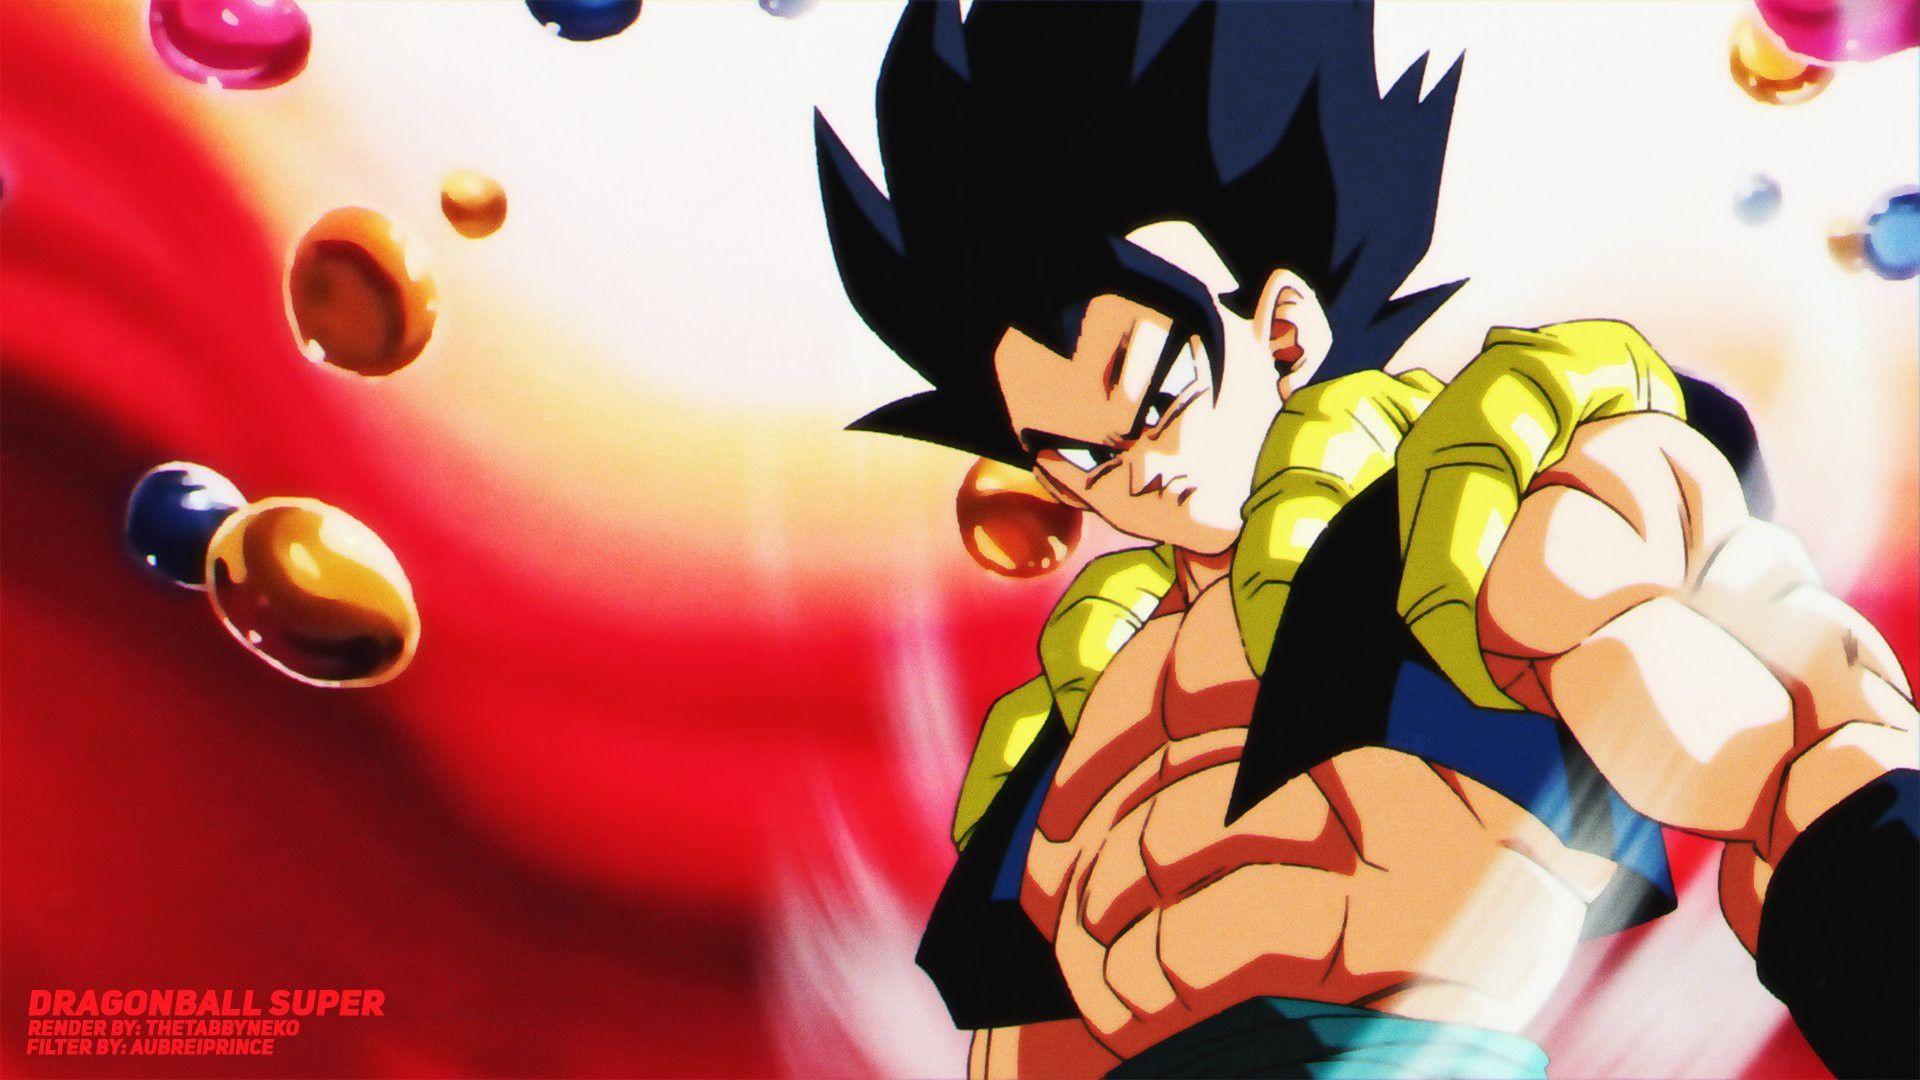 Pin By Ariana Grande On Dragon Ball Z Dragon Ball Art Dragon Ball Super Goku Dragon Ball Z